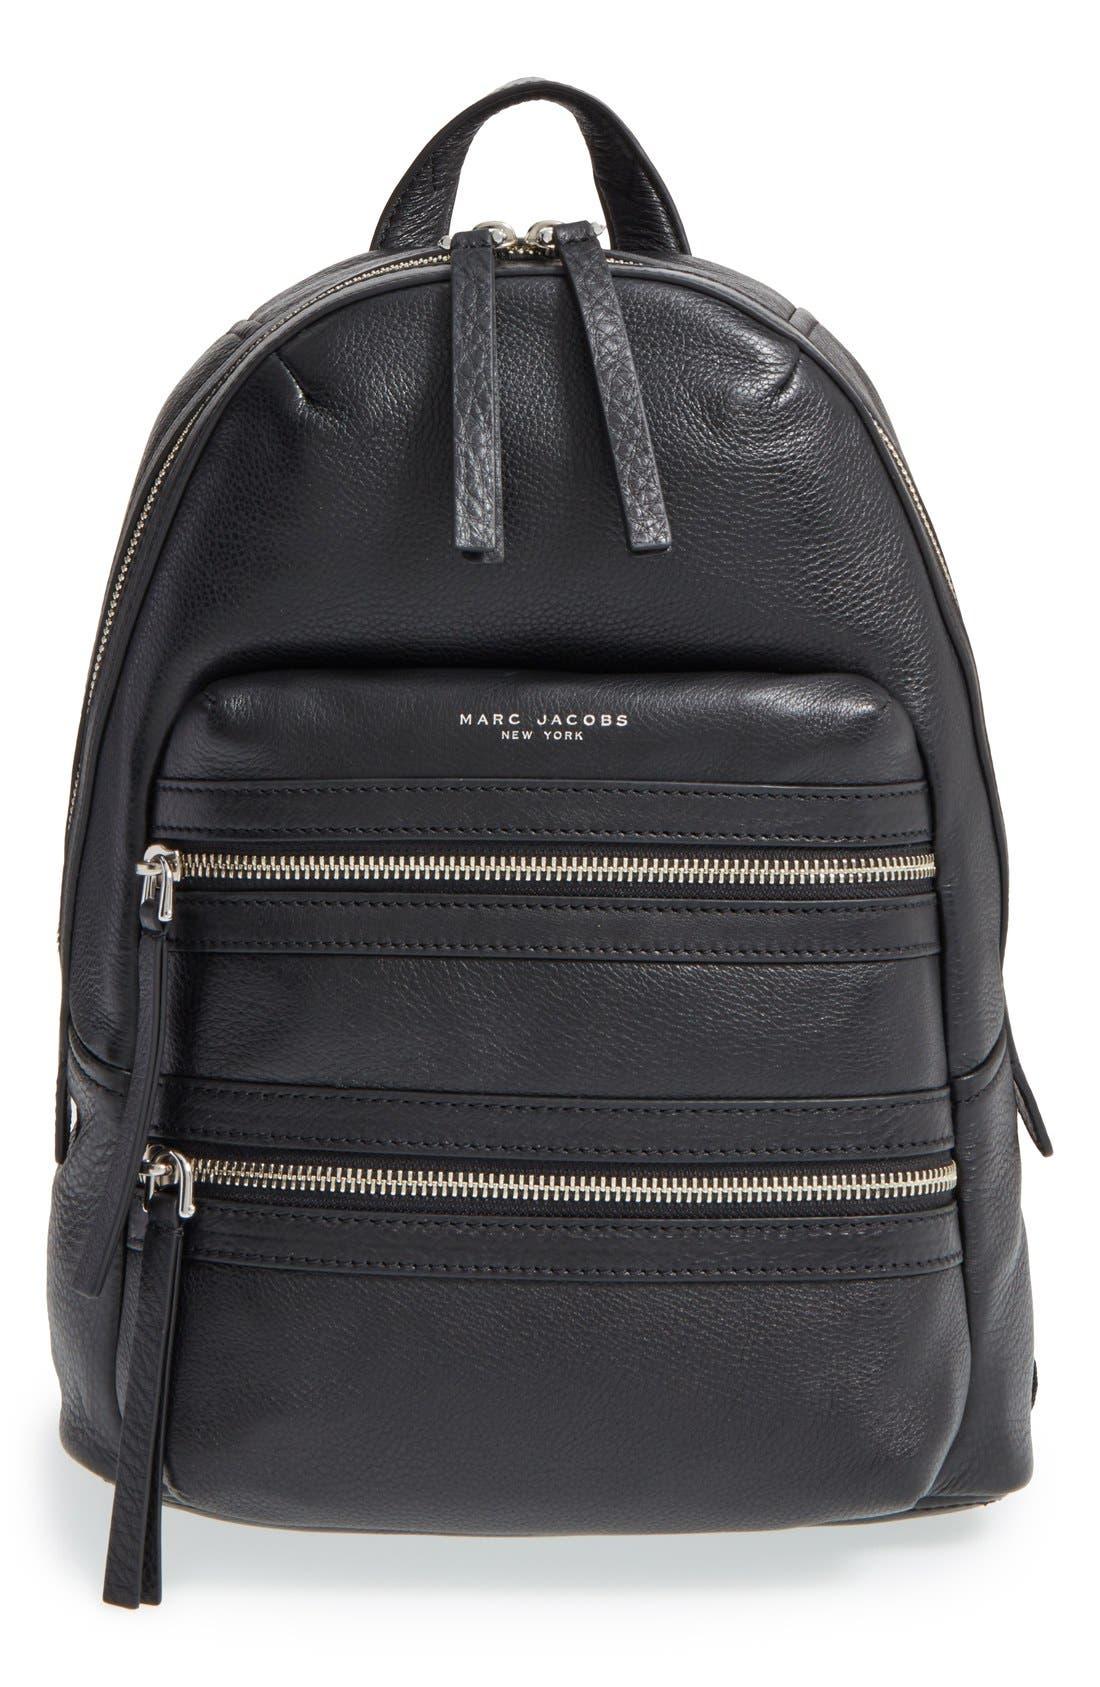 Main Image - MARC JACOBS 'Biker' Leather Backpack